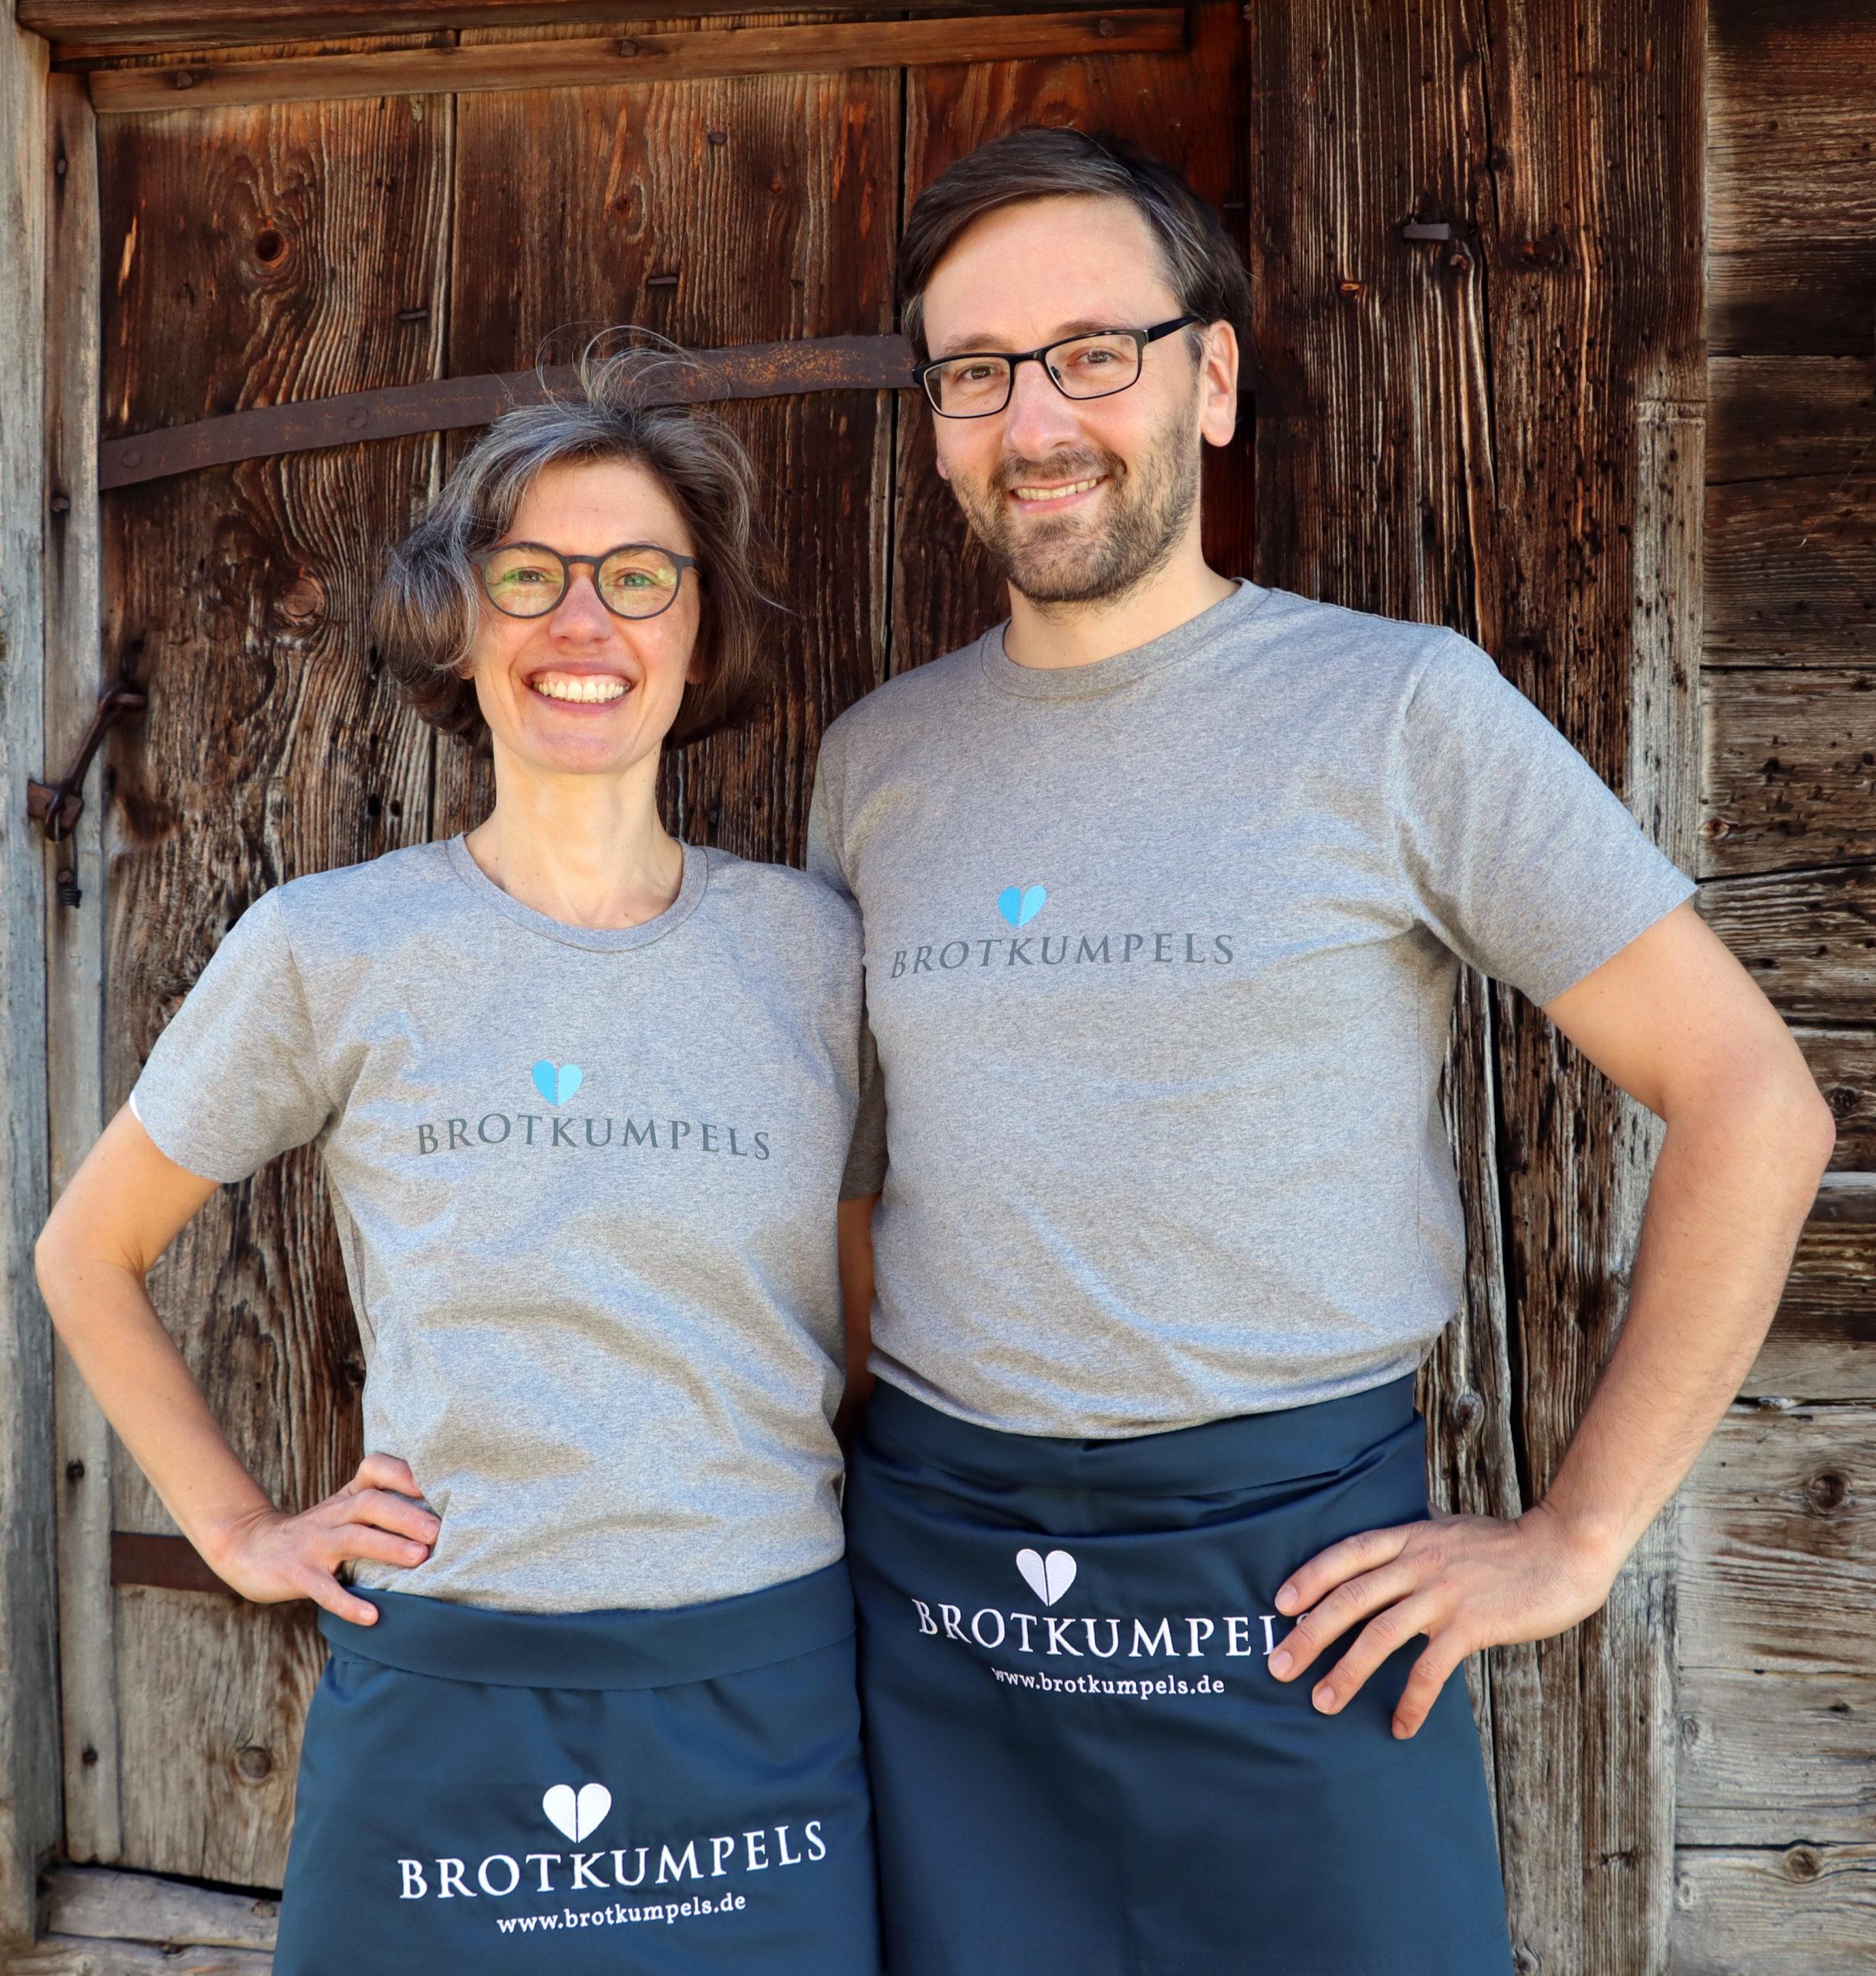 Christina Weiß und Lutz Geißler - Die Brotkumpels. (Foto: Stephan Klang)